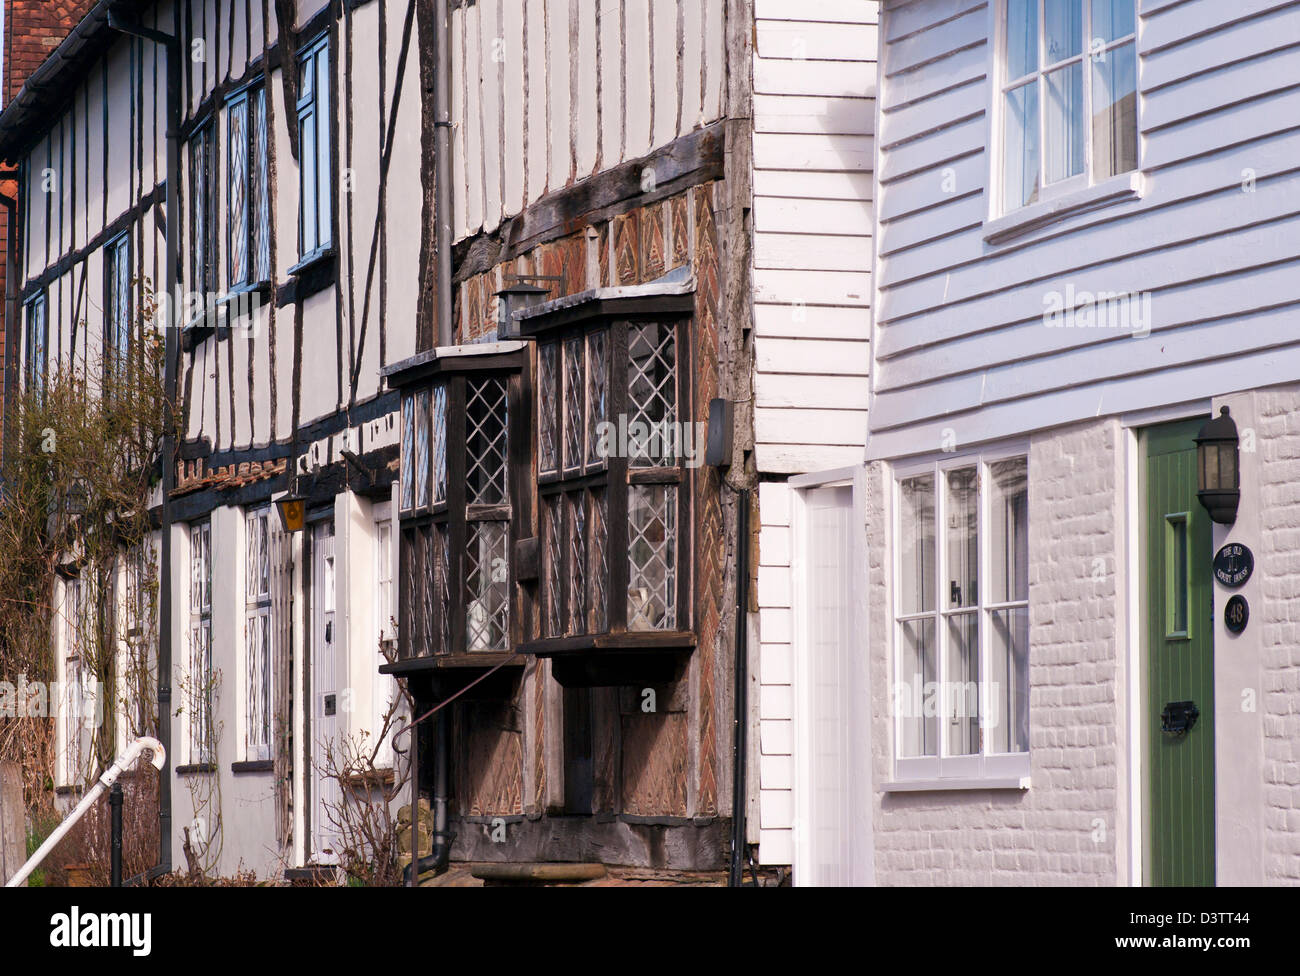 Period Tudor Houses Robertsbridge East Sussex UK - Stock Image